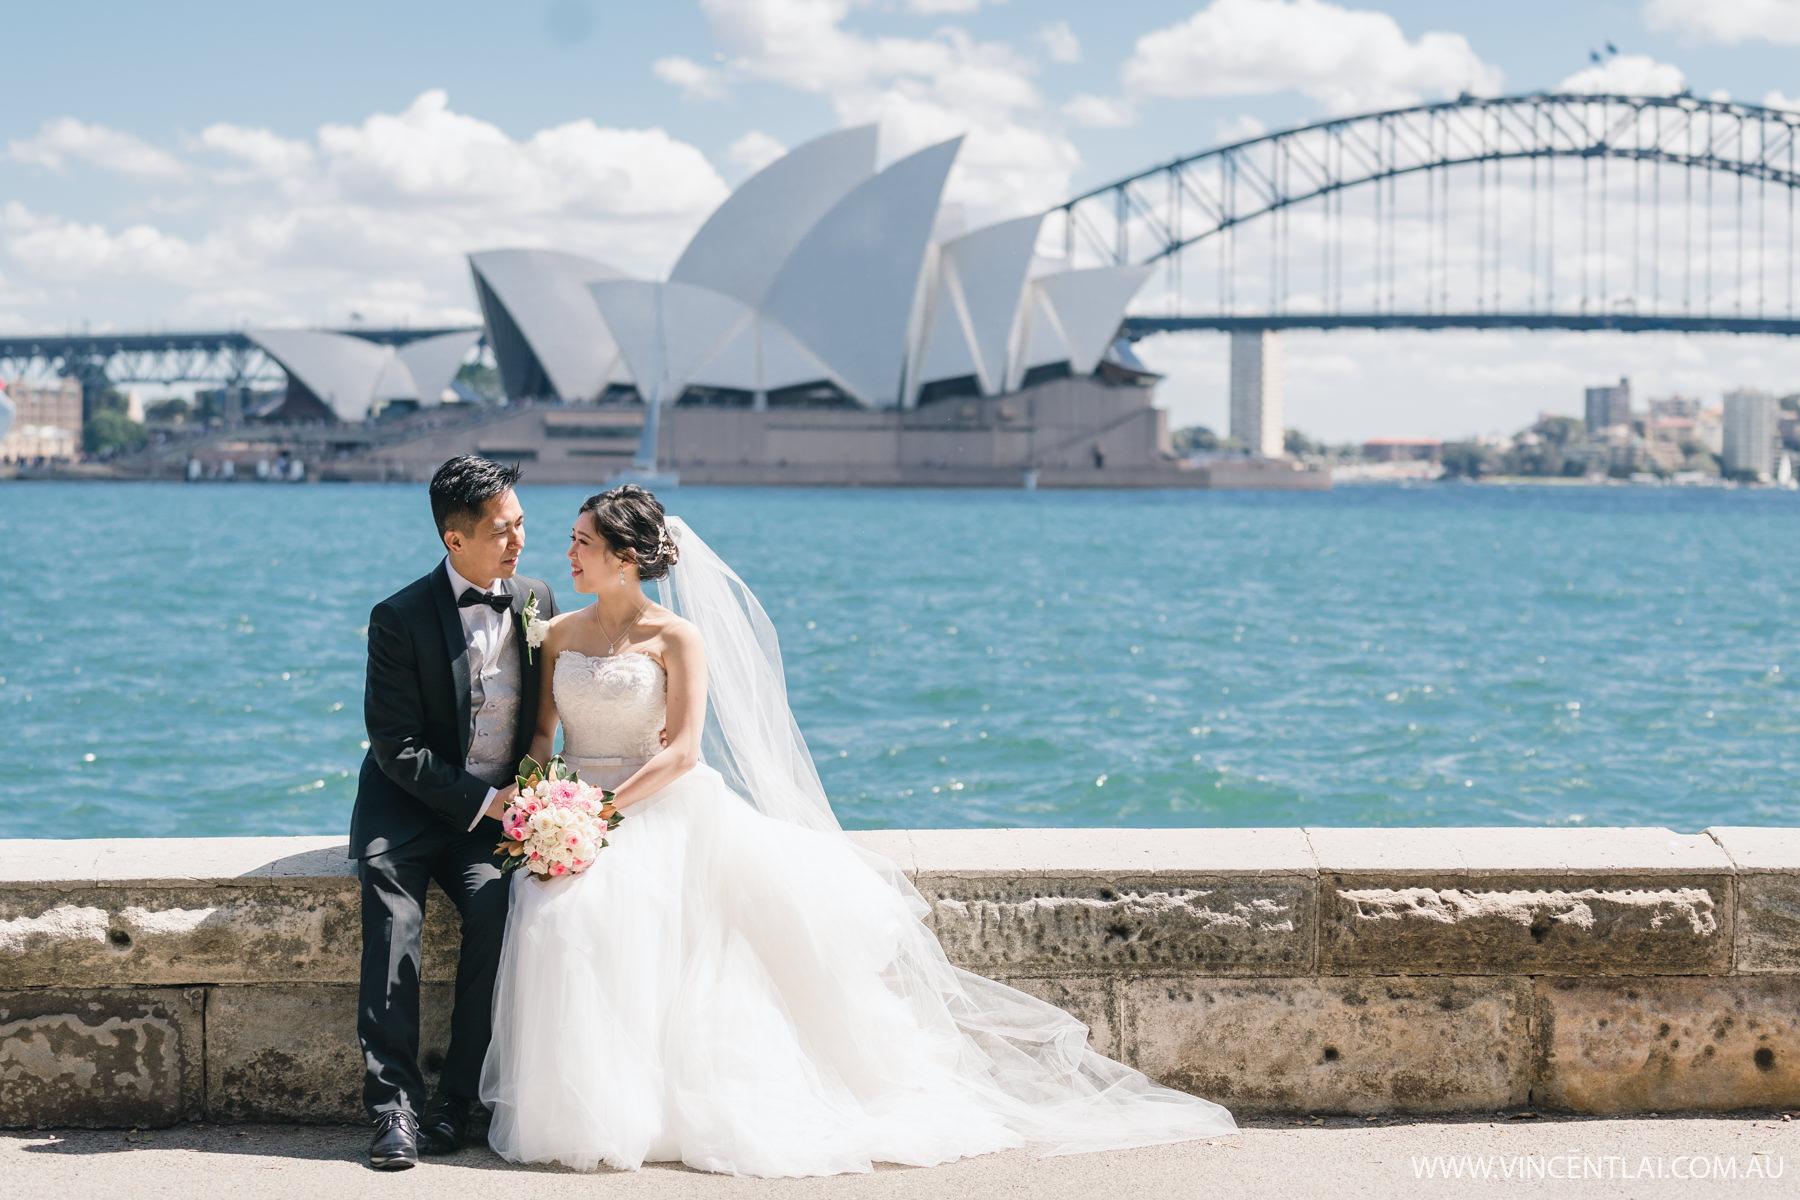 Royal Botanic Garden Wedding Photo Sydney